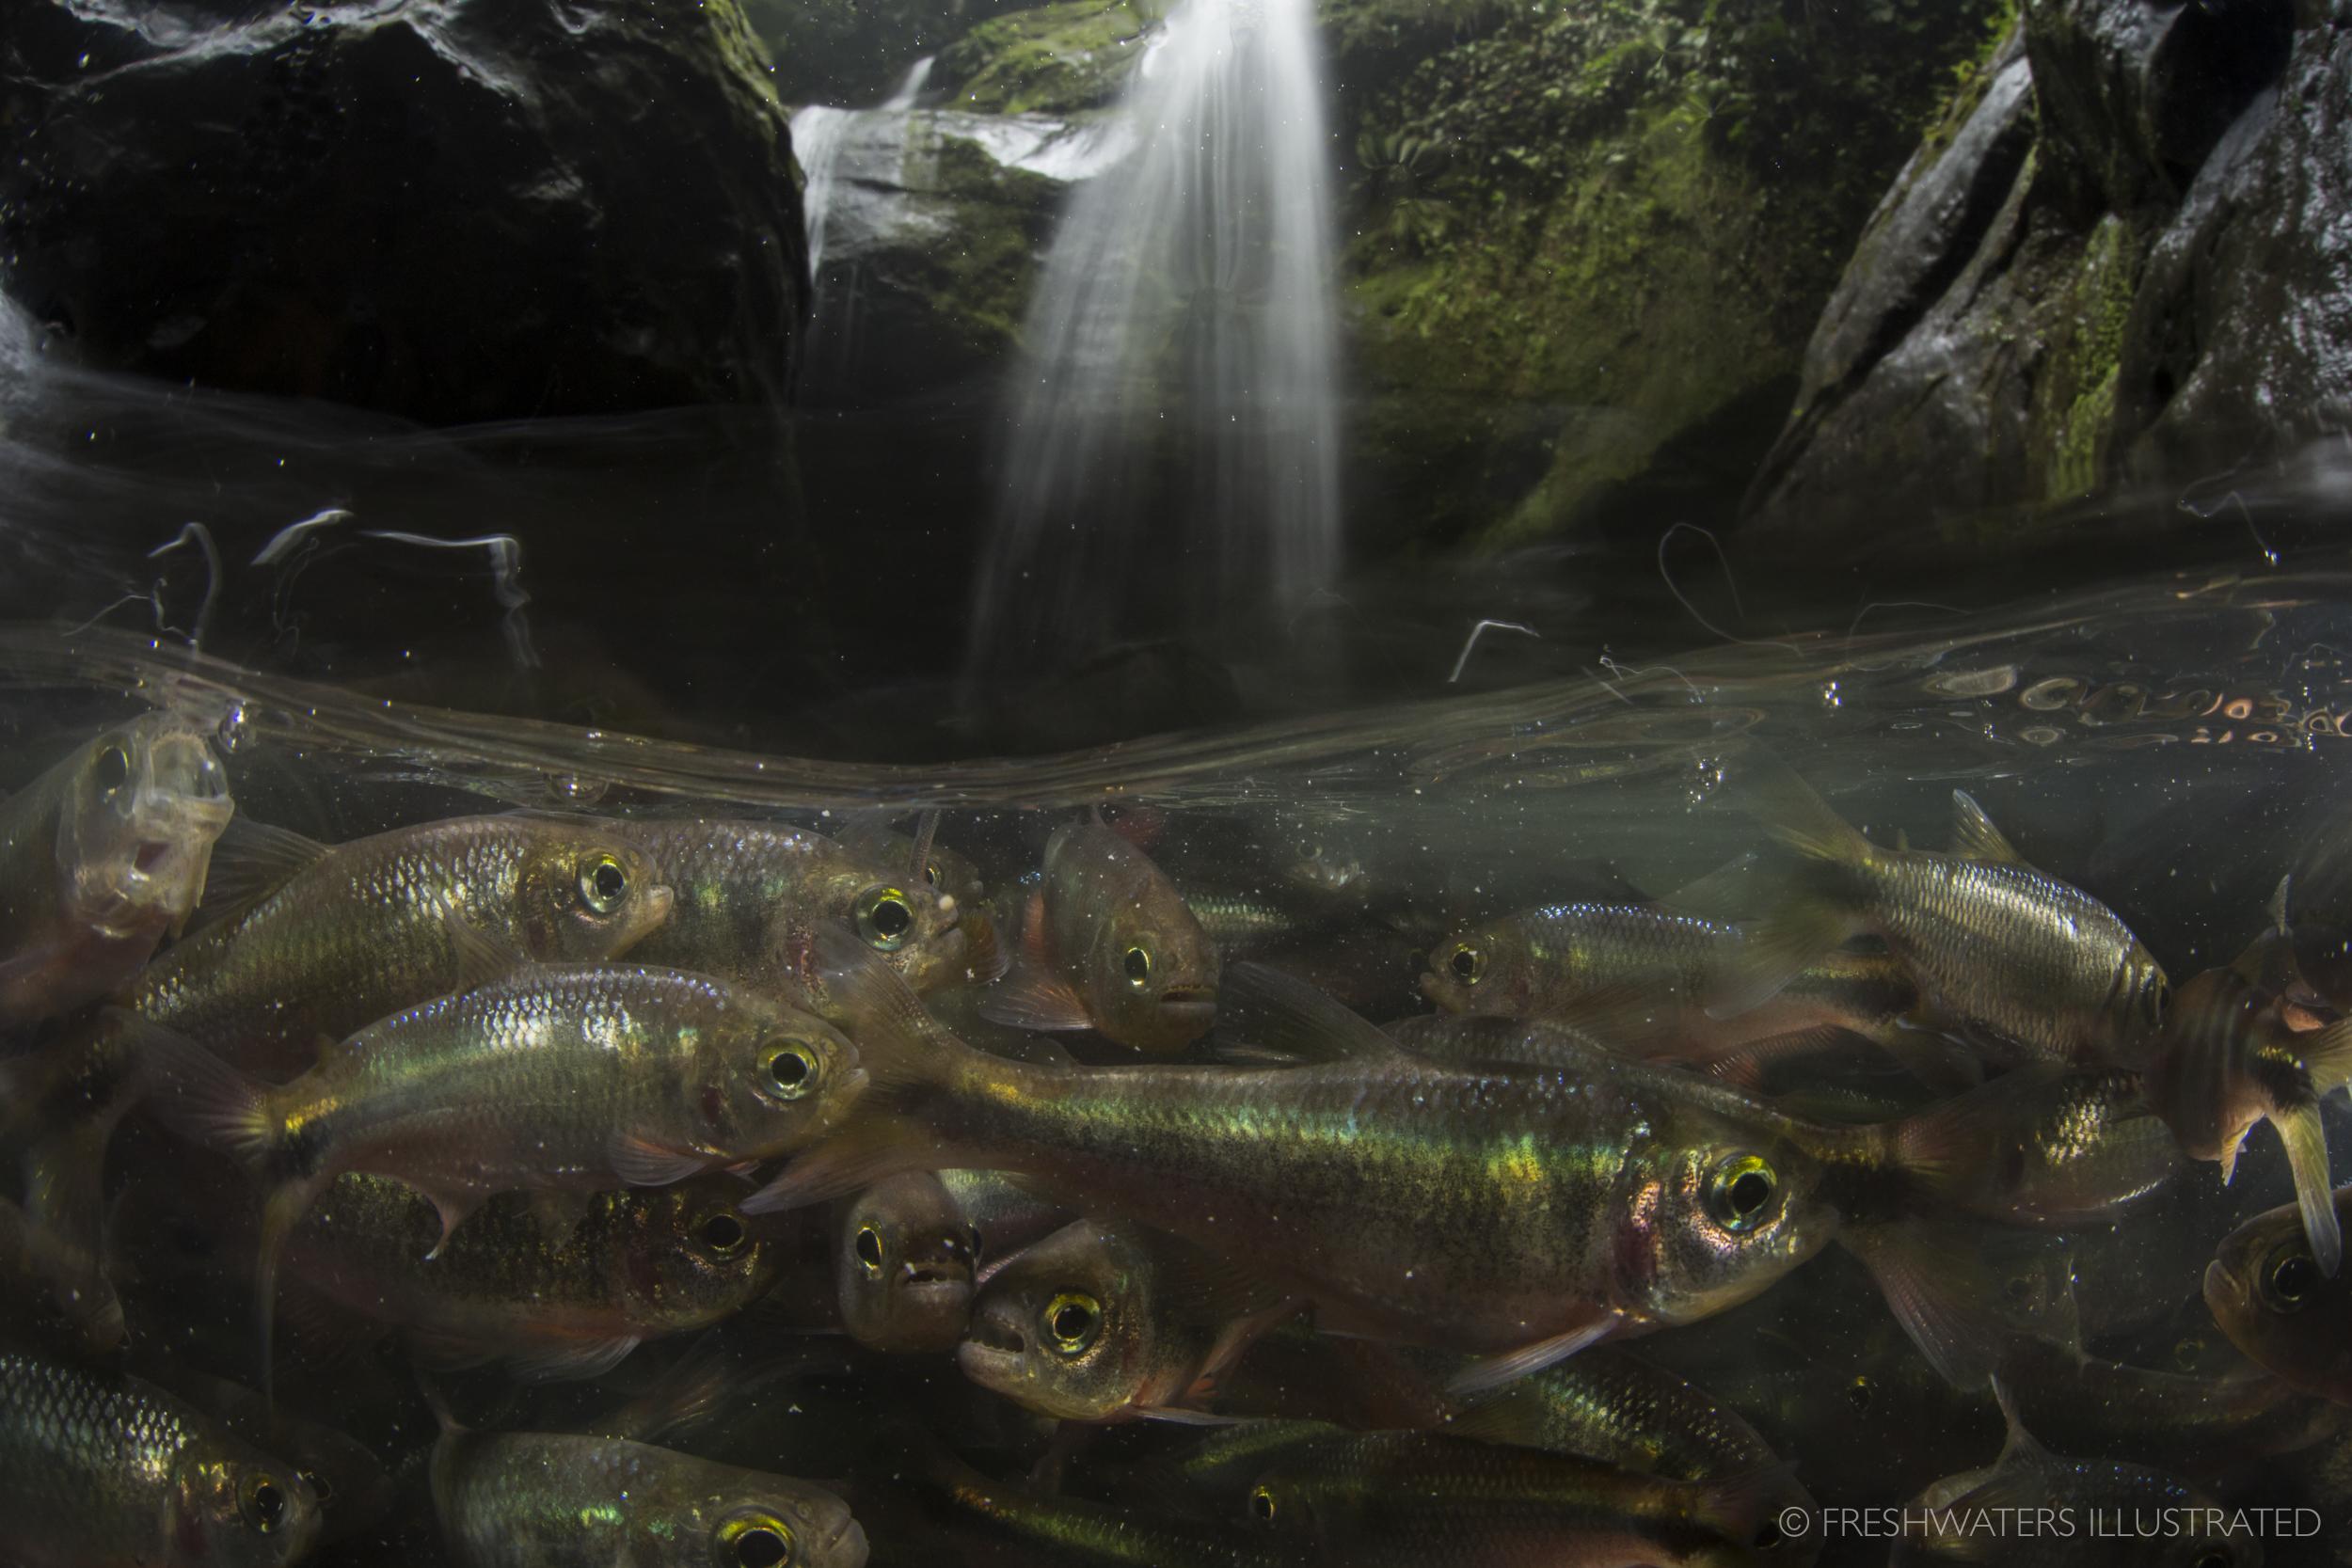 Schooling Creek Tetra (Bryconamericus scleroparius) Rio Carbon, Costa Rica